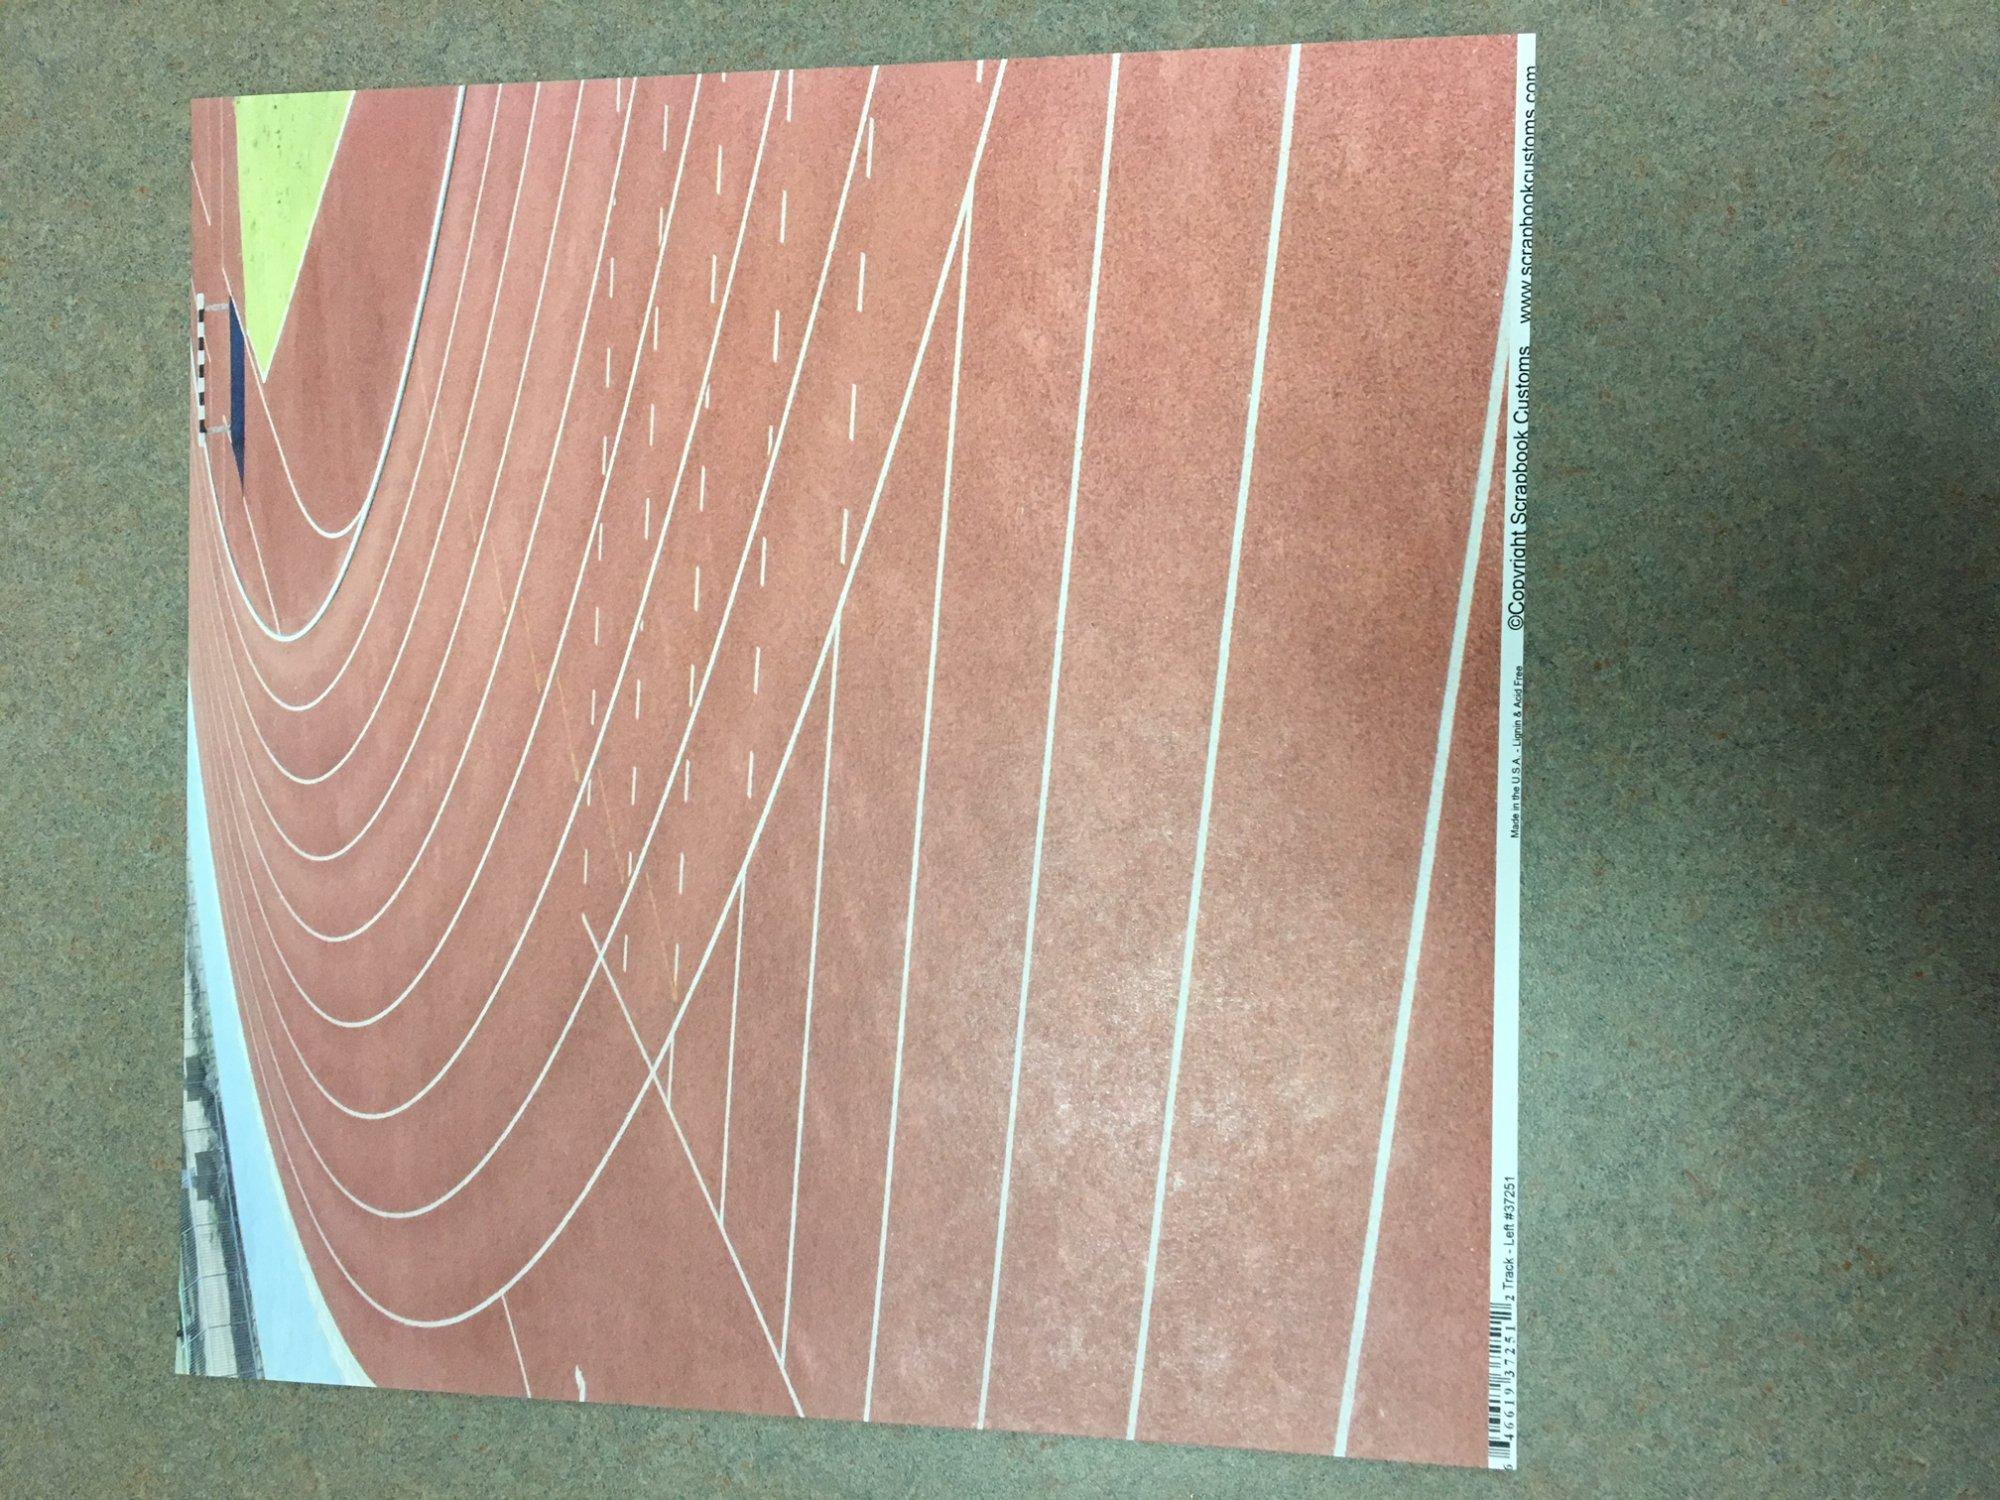 Track- left